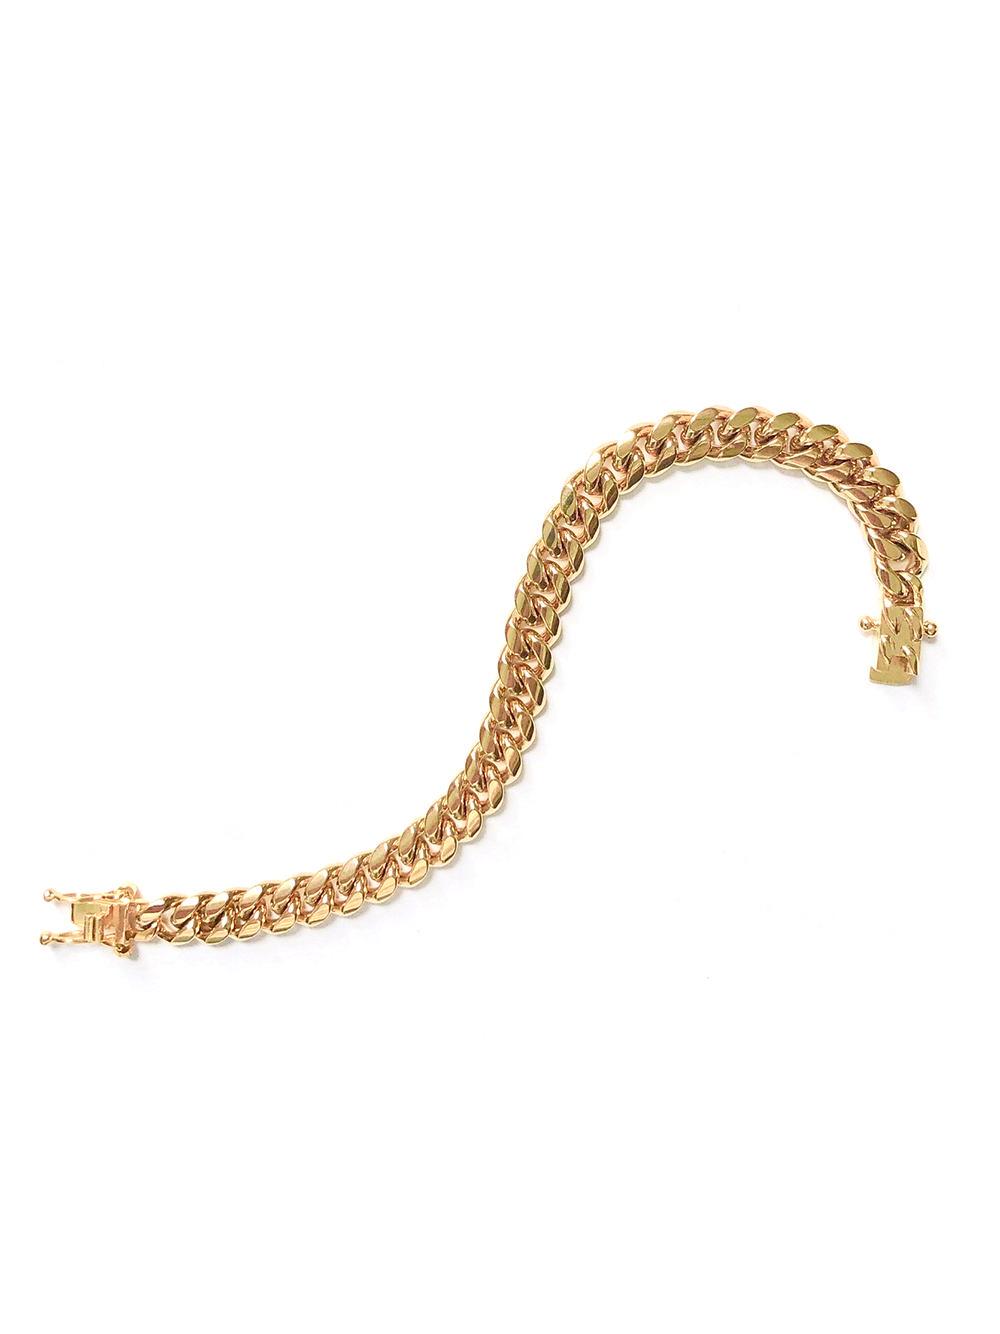 Ruth Curb Chain Bracelet 8mm Item # FB24303